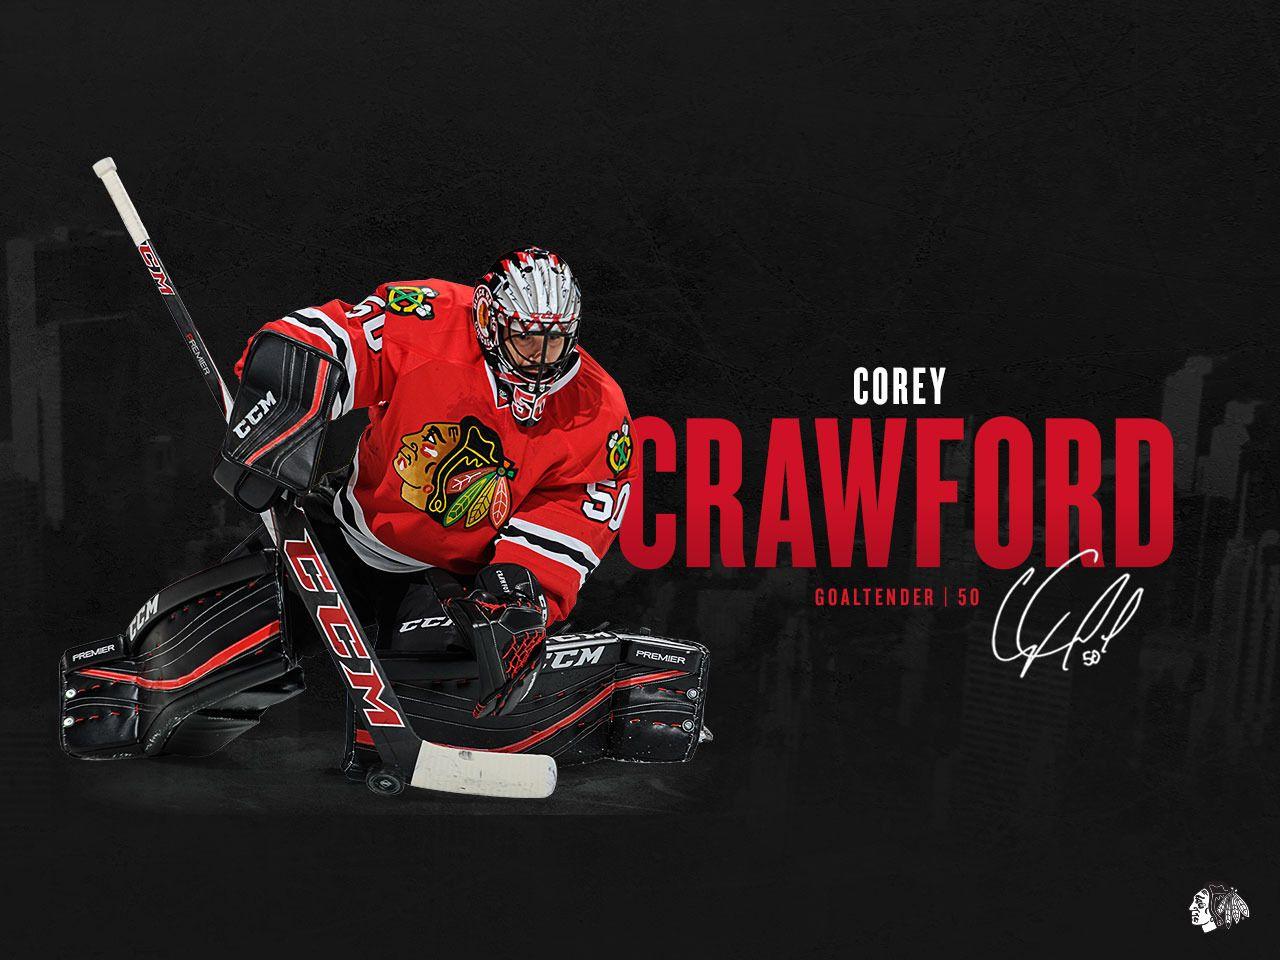 Corey Crawford Crow 50 Blackhawks Chicago Blackhawks Wallpaper Chicago Blackhawks Hockey Blackhawks